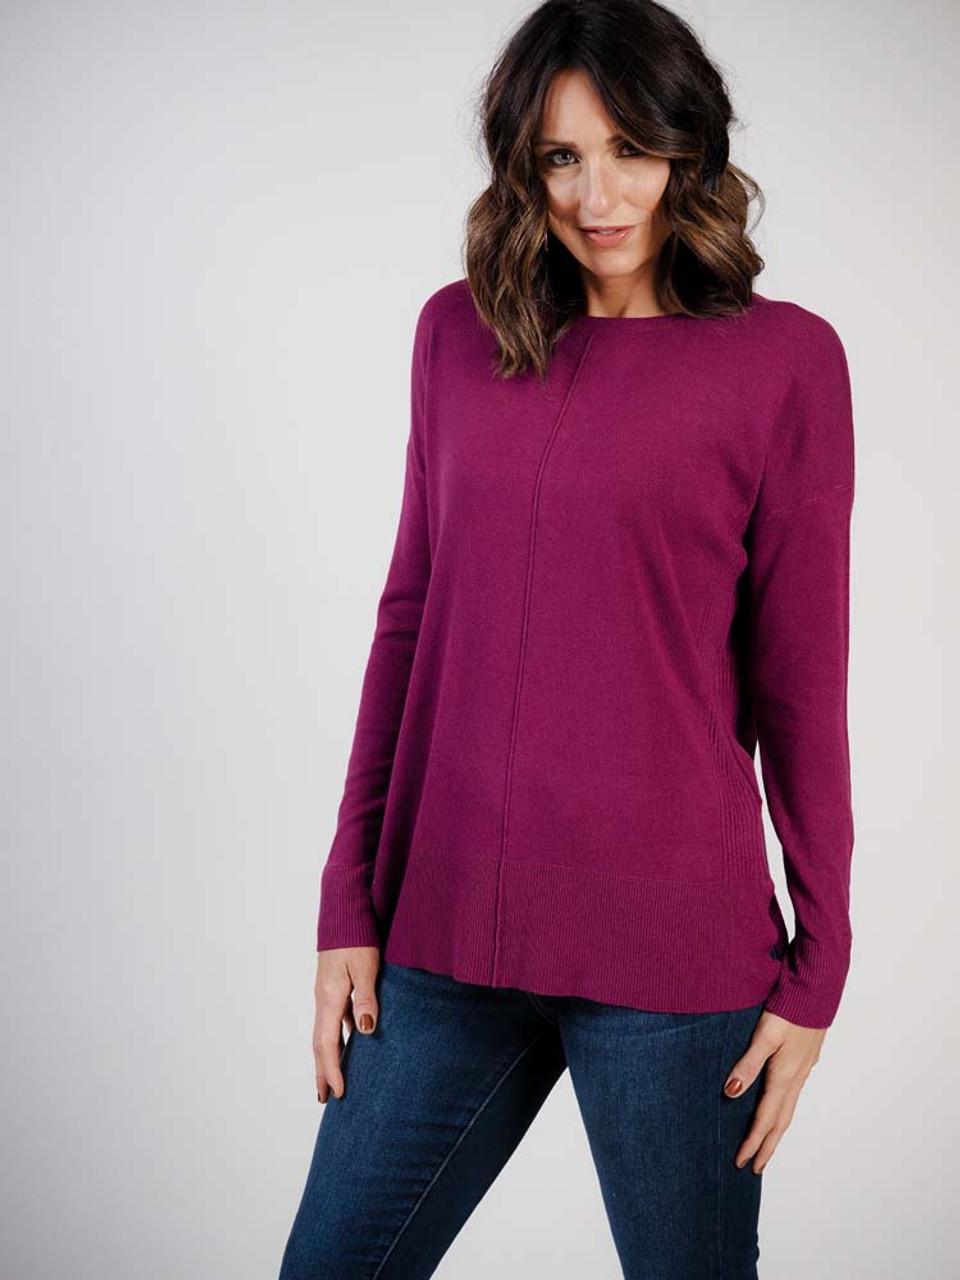 plum lightweight sweater